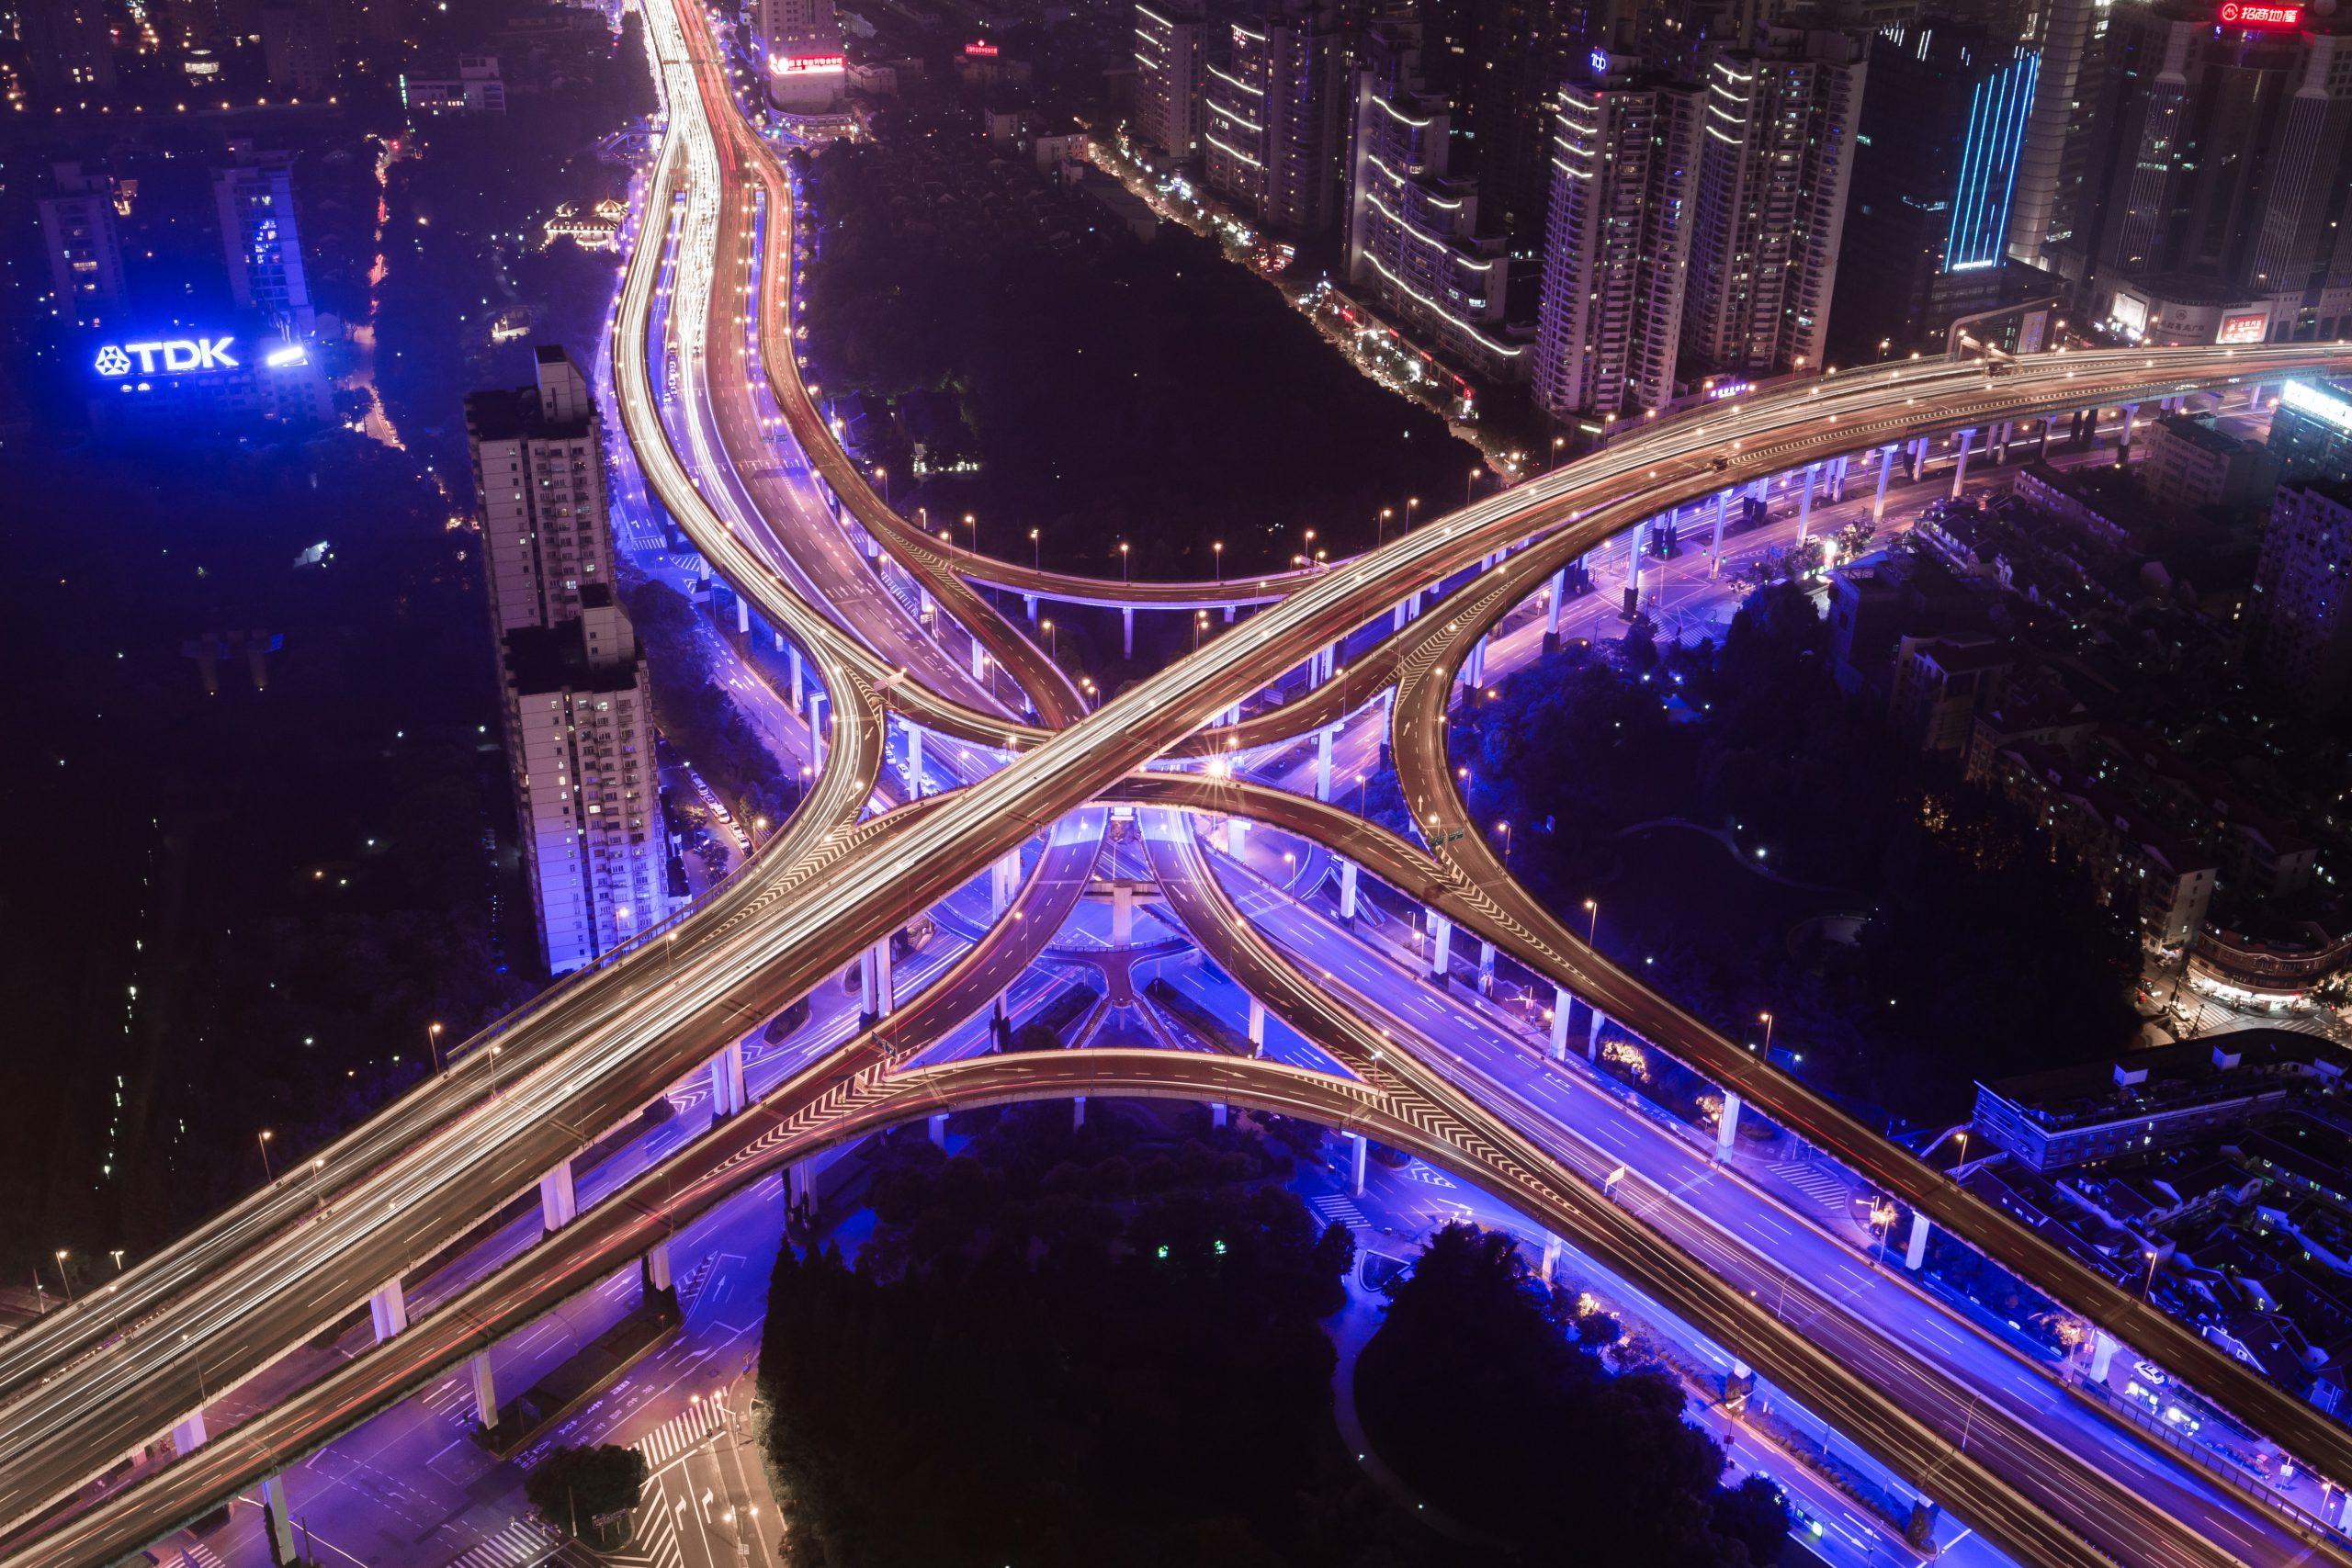 McKinsey: reimagining mobility